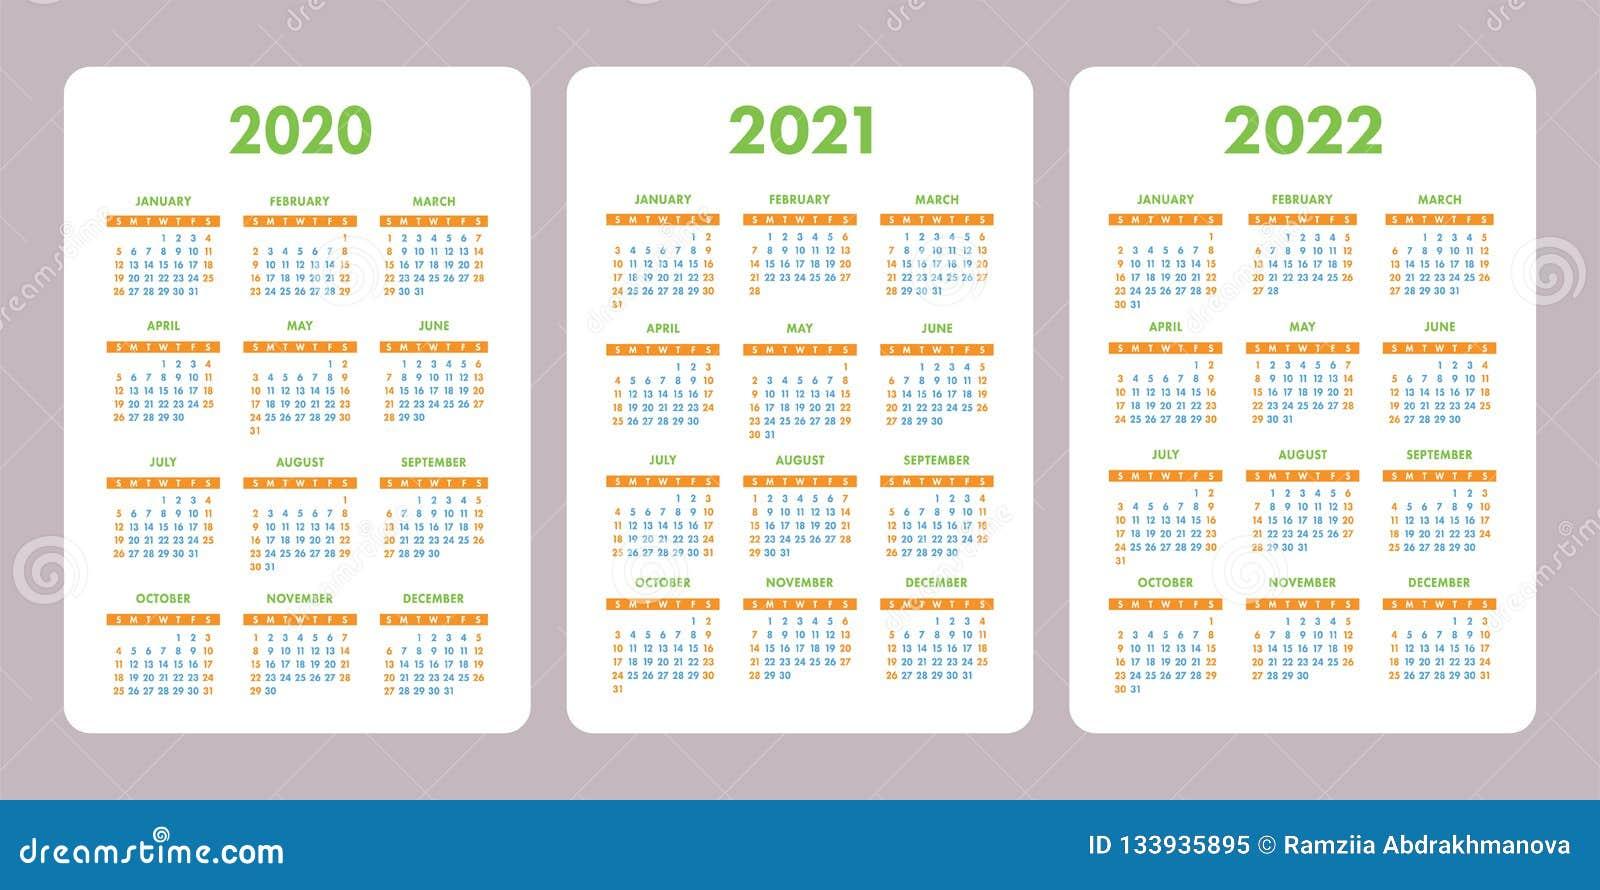 Calendrier 2021 Gratuit.Calendrier 2020 2021 2022 Ans De Poche Calibre Vertical De